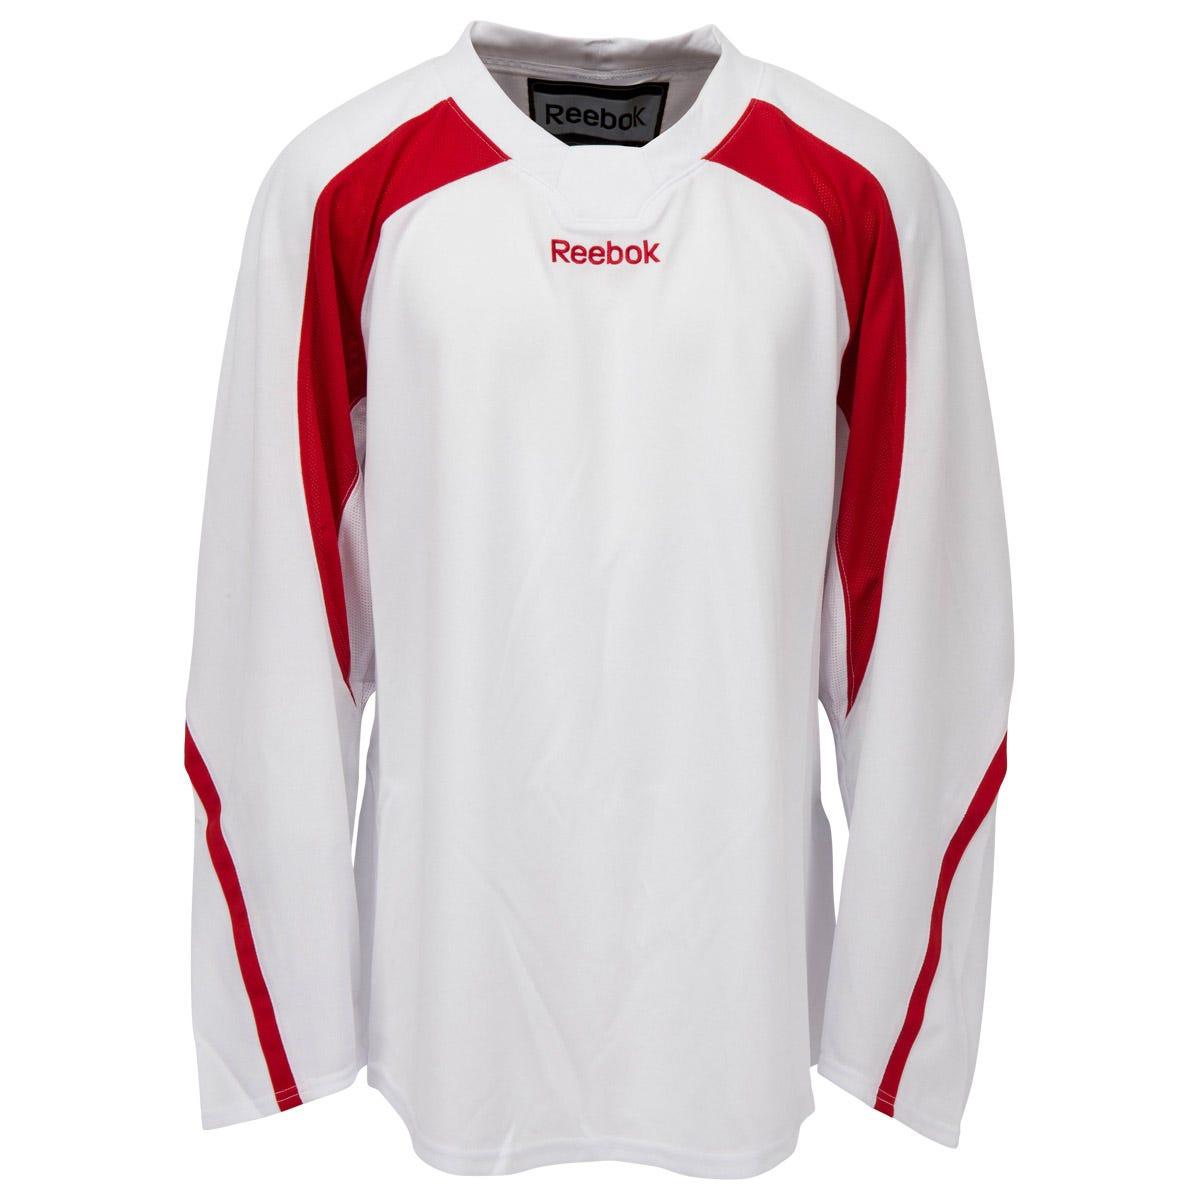 b011dd5a033 SKU-MS1362983 CCM 7171 V2 Team Light Senior Skate Suit Pant from ...